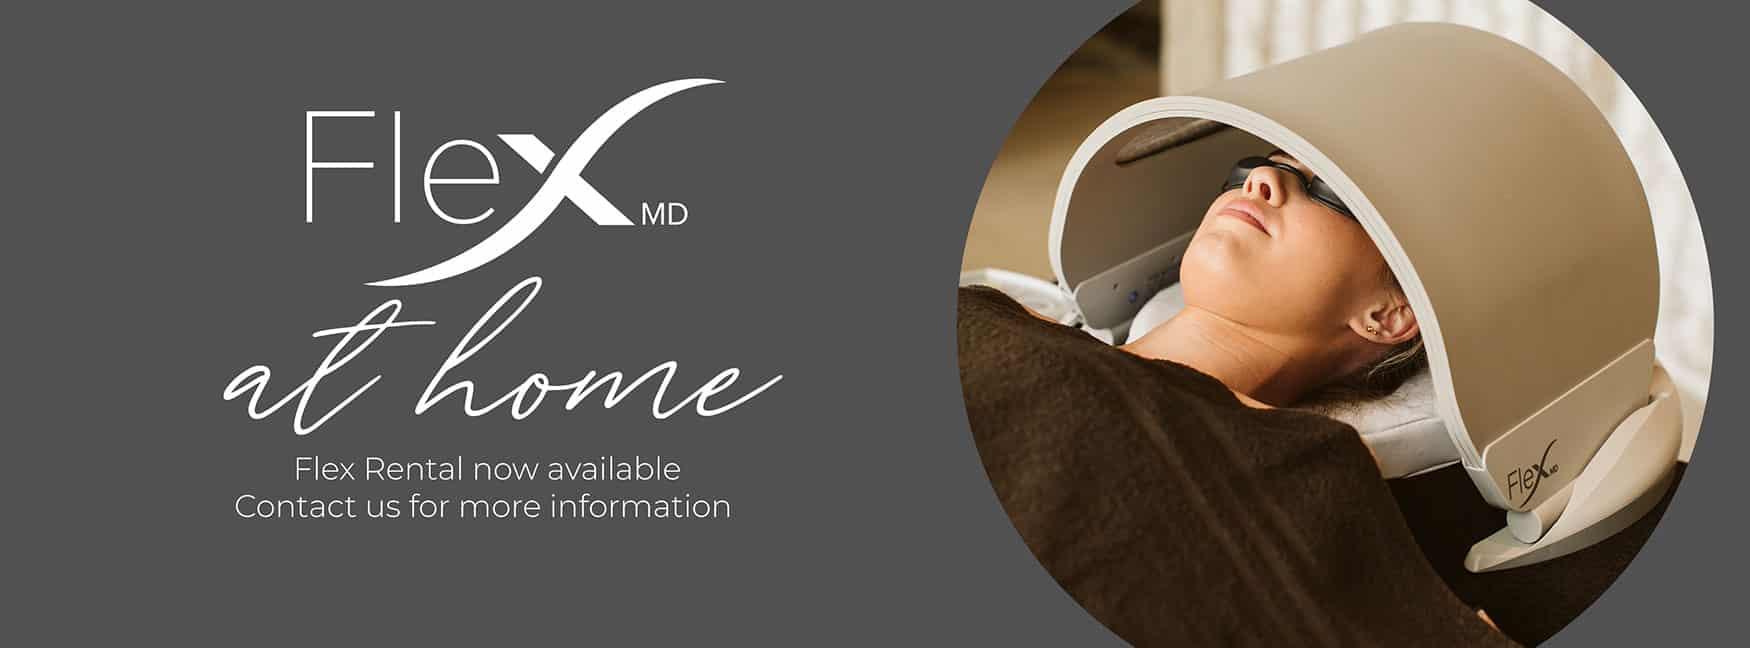 Dermalux Flex MD Rental in Billericay Essex